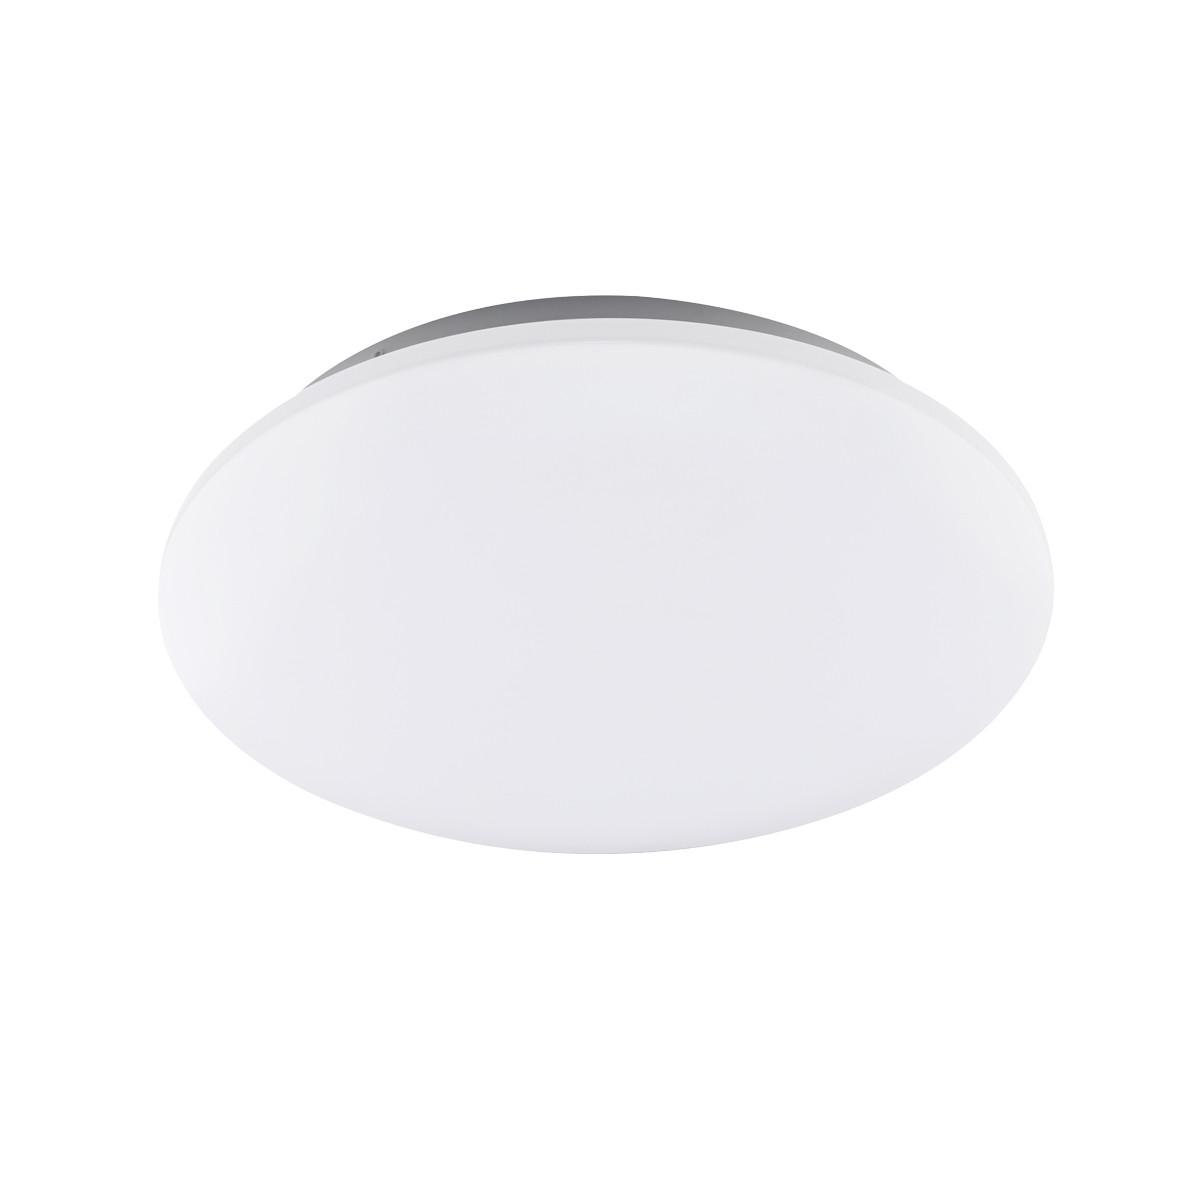 Zero II Flush 38cm Round 36W LED 5000K, 2450lm, White